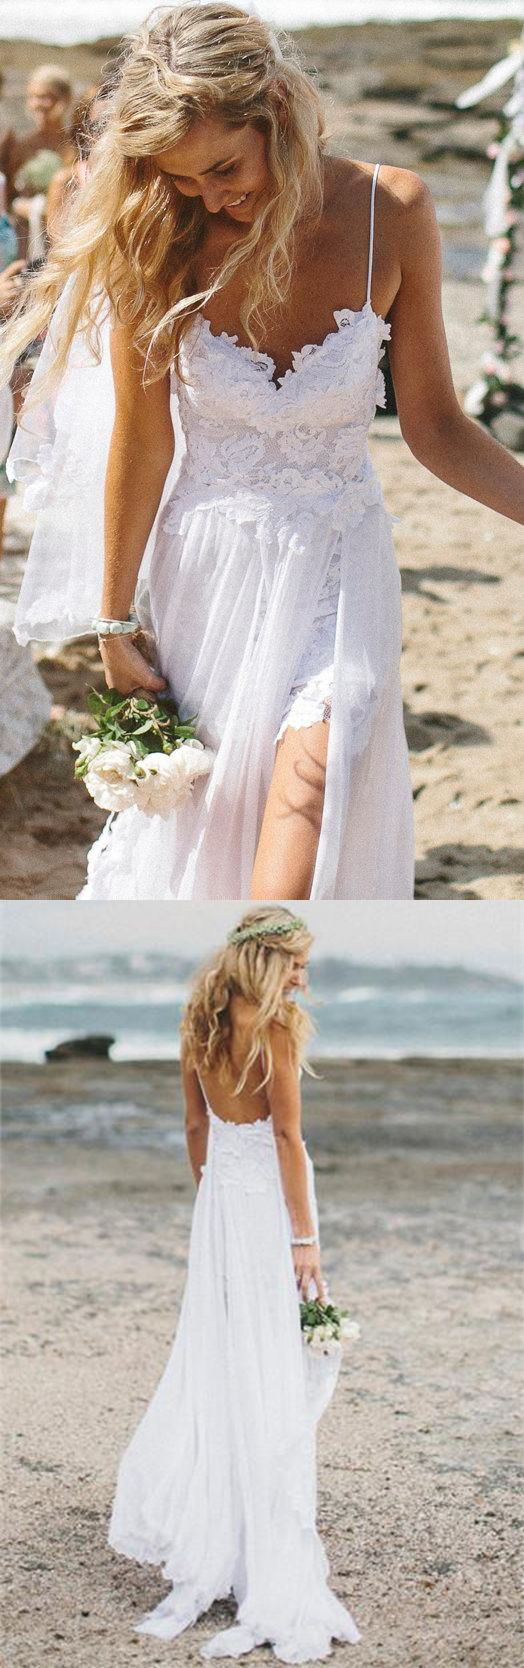 Modest Wedding Dress Beautiful Wedding Dresses with long white ...